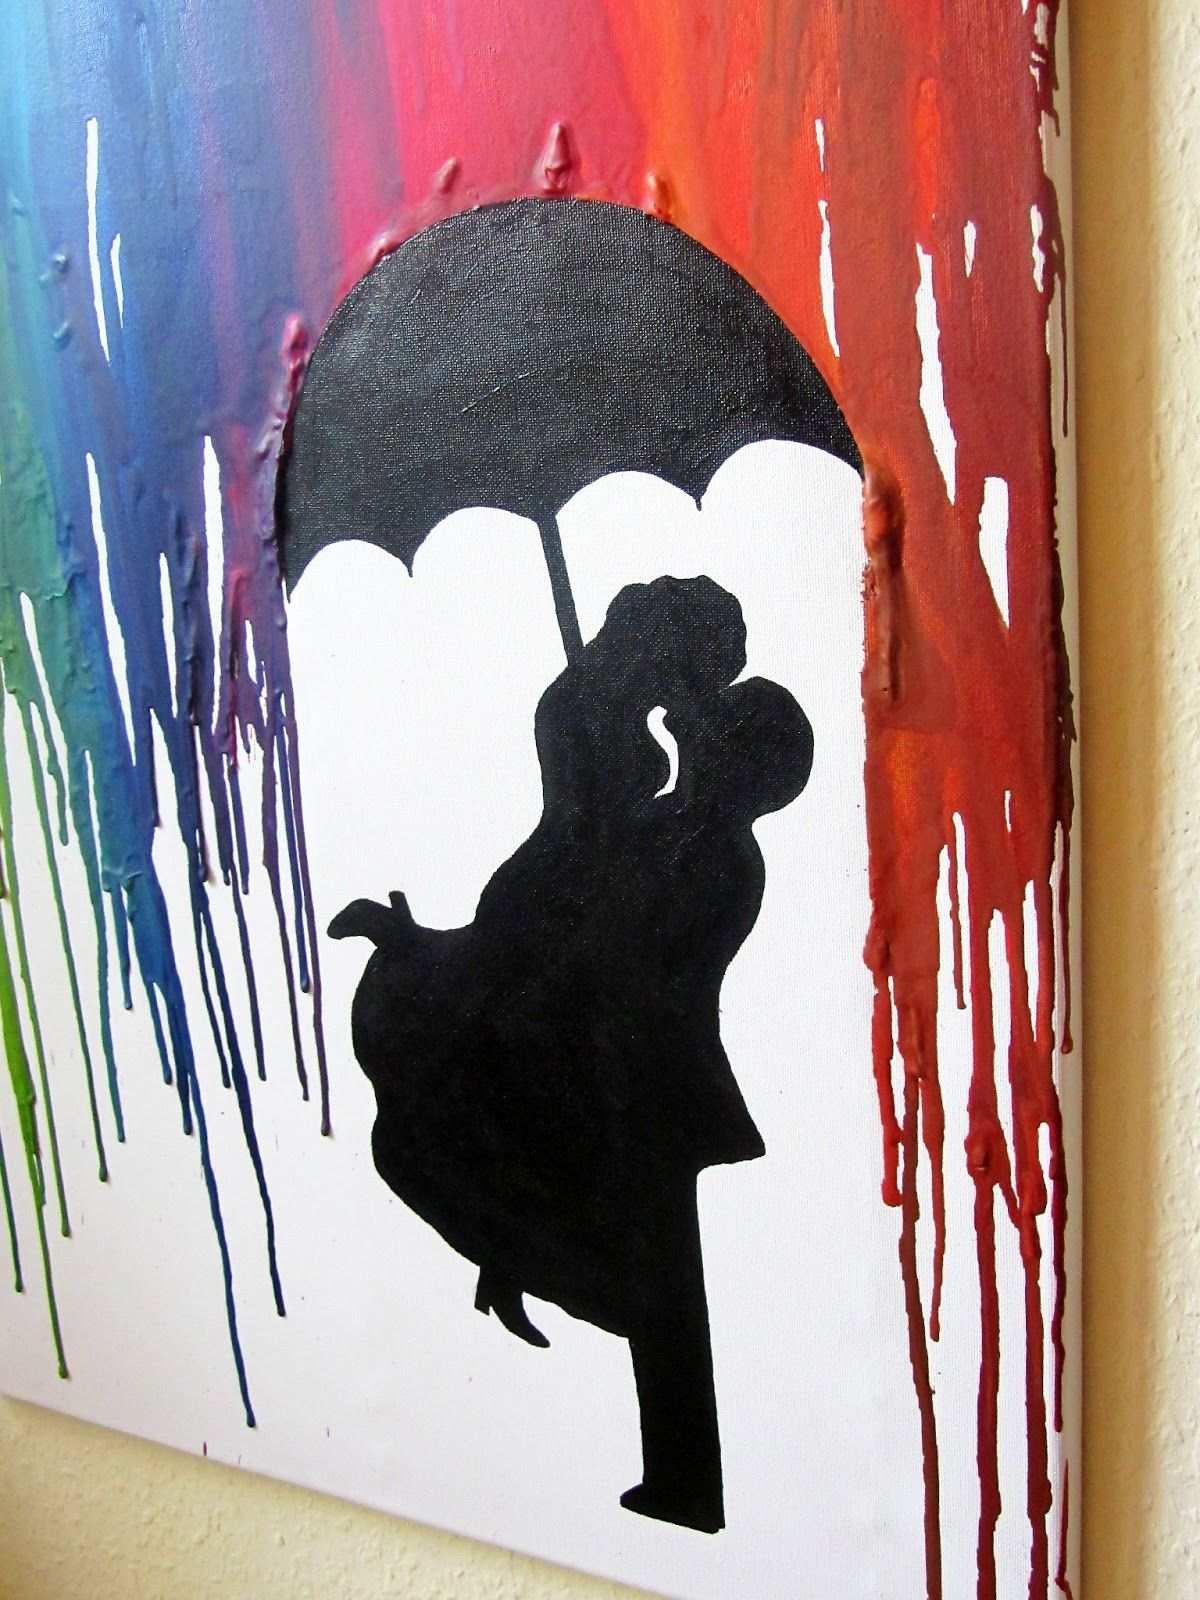 Crayon Art Parchen Im Regen Geschmolzene Wachsmalkunst